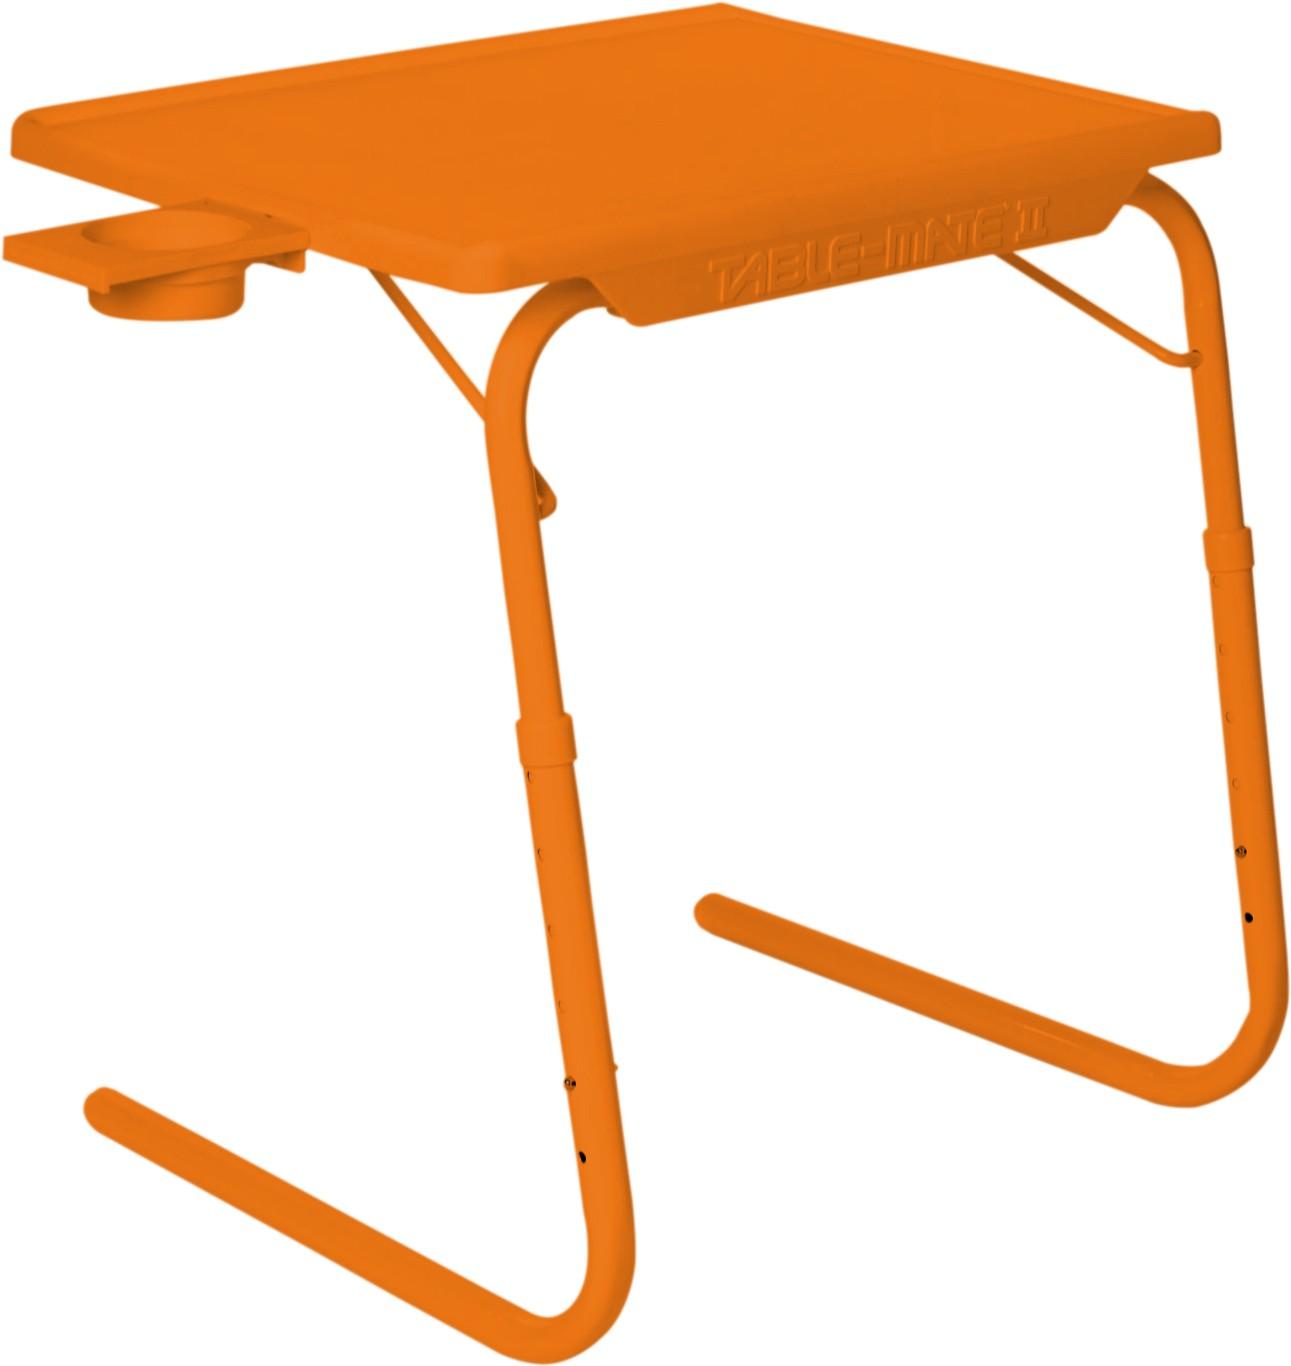 View Table Mate Orange ADJUSTABLE table mate Plastic Study Table(Finish Color - Orange) Furniture (Tablemate)